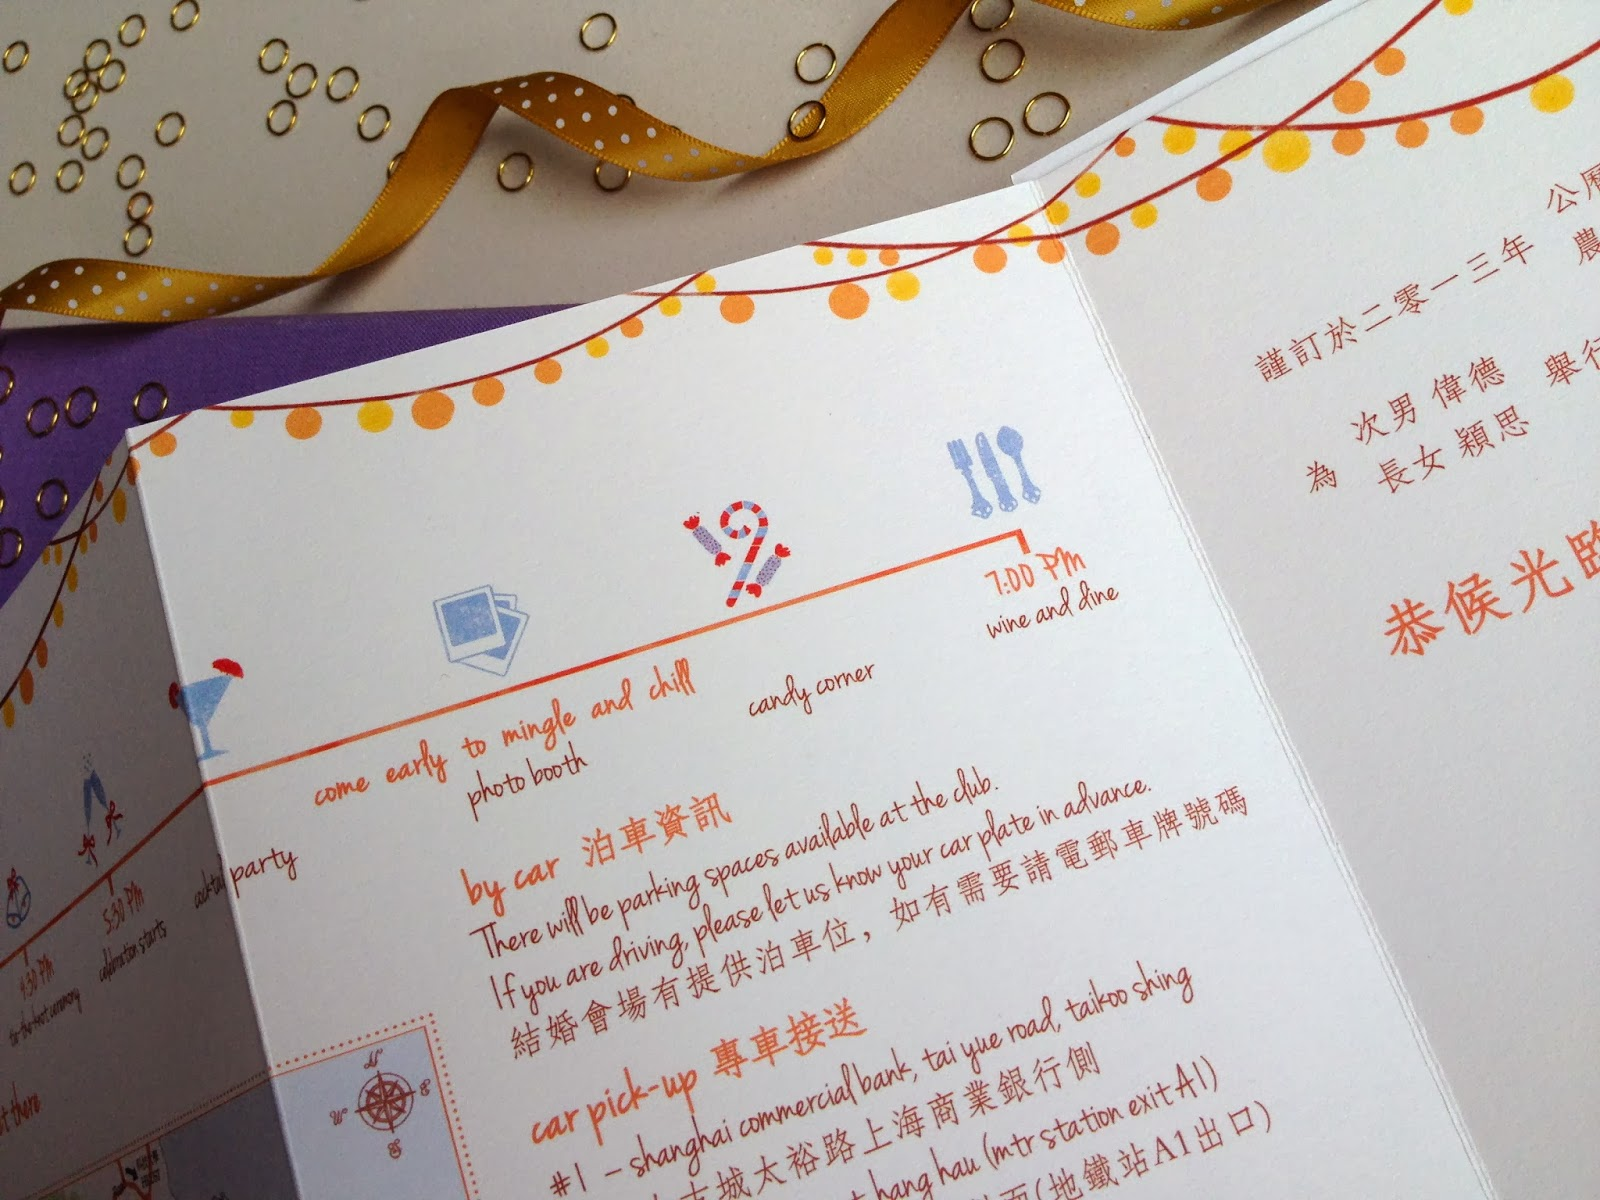 Wedding invitation cards hong kong all the best ideas about marriage kalo make art bespoke wedding invitation designs book of stopboris Choice Image